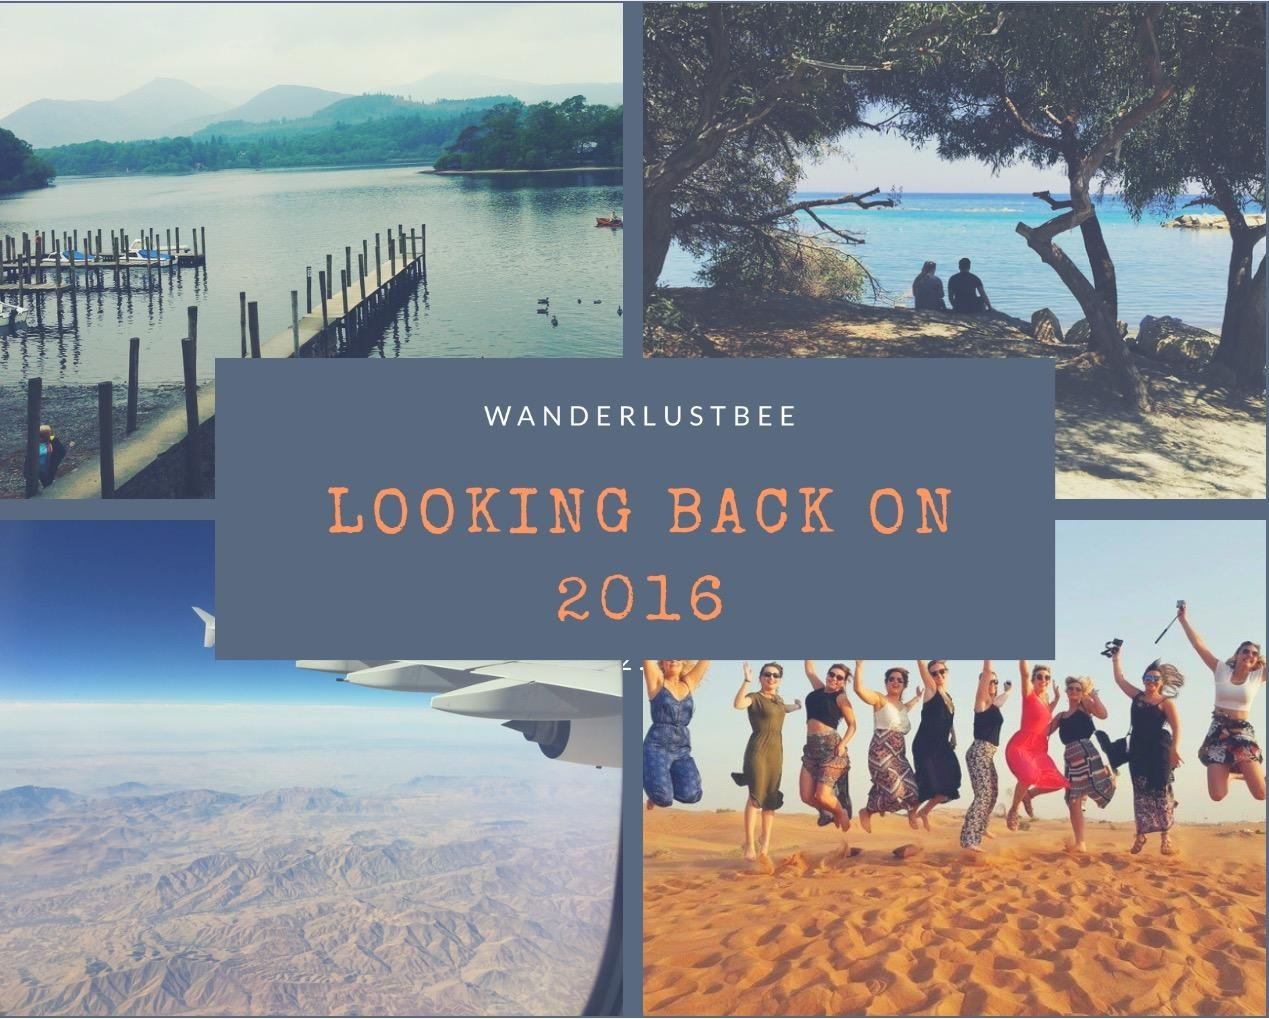 Wanderlust Bee Looking back on 2016